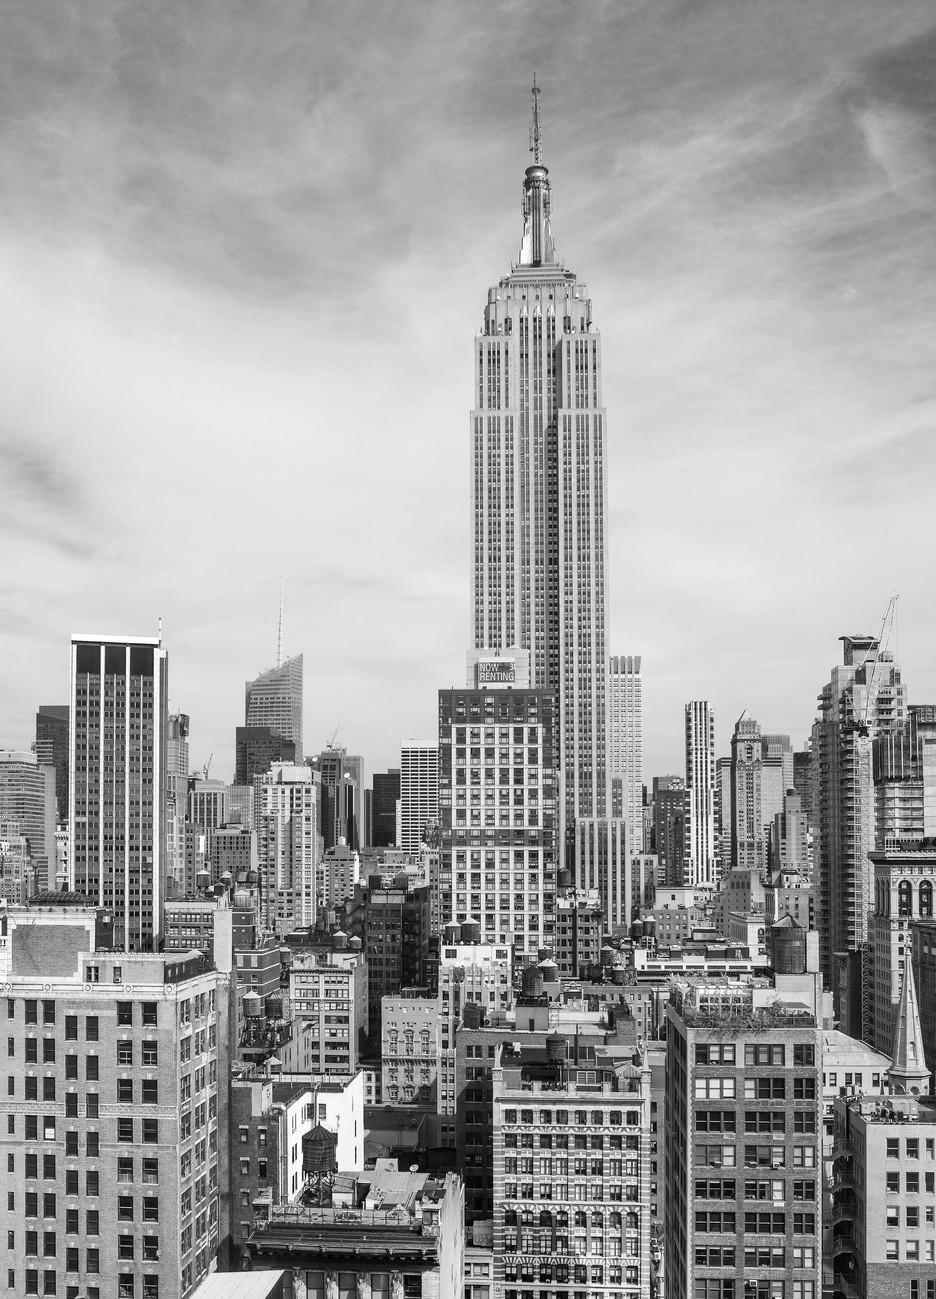 Fotomurale nueva york the empire state building papel - Papel pintado nueva york ...